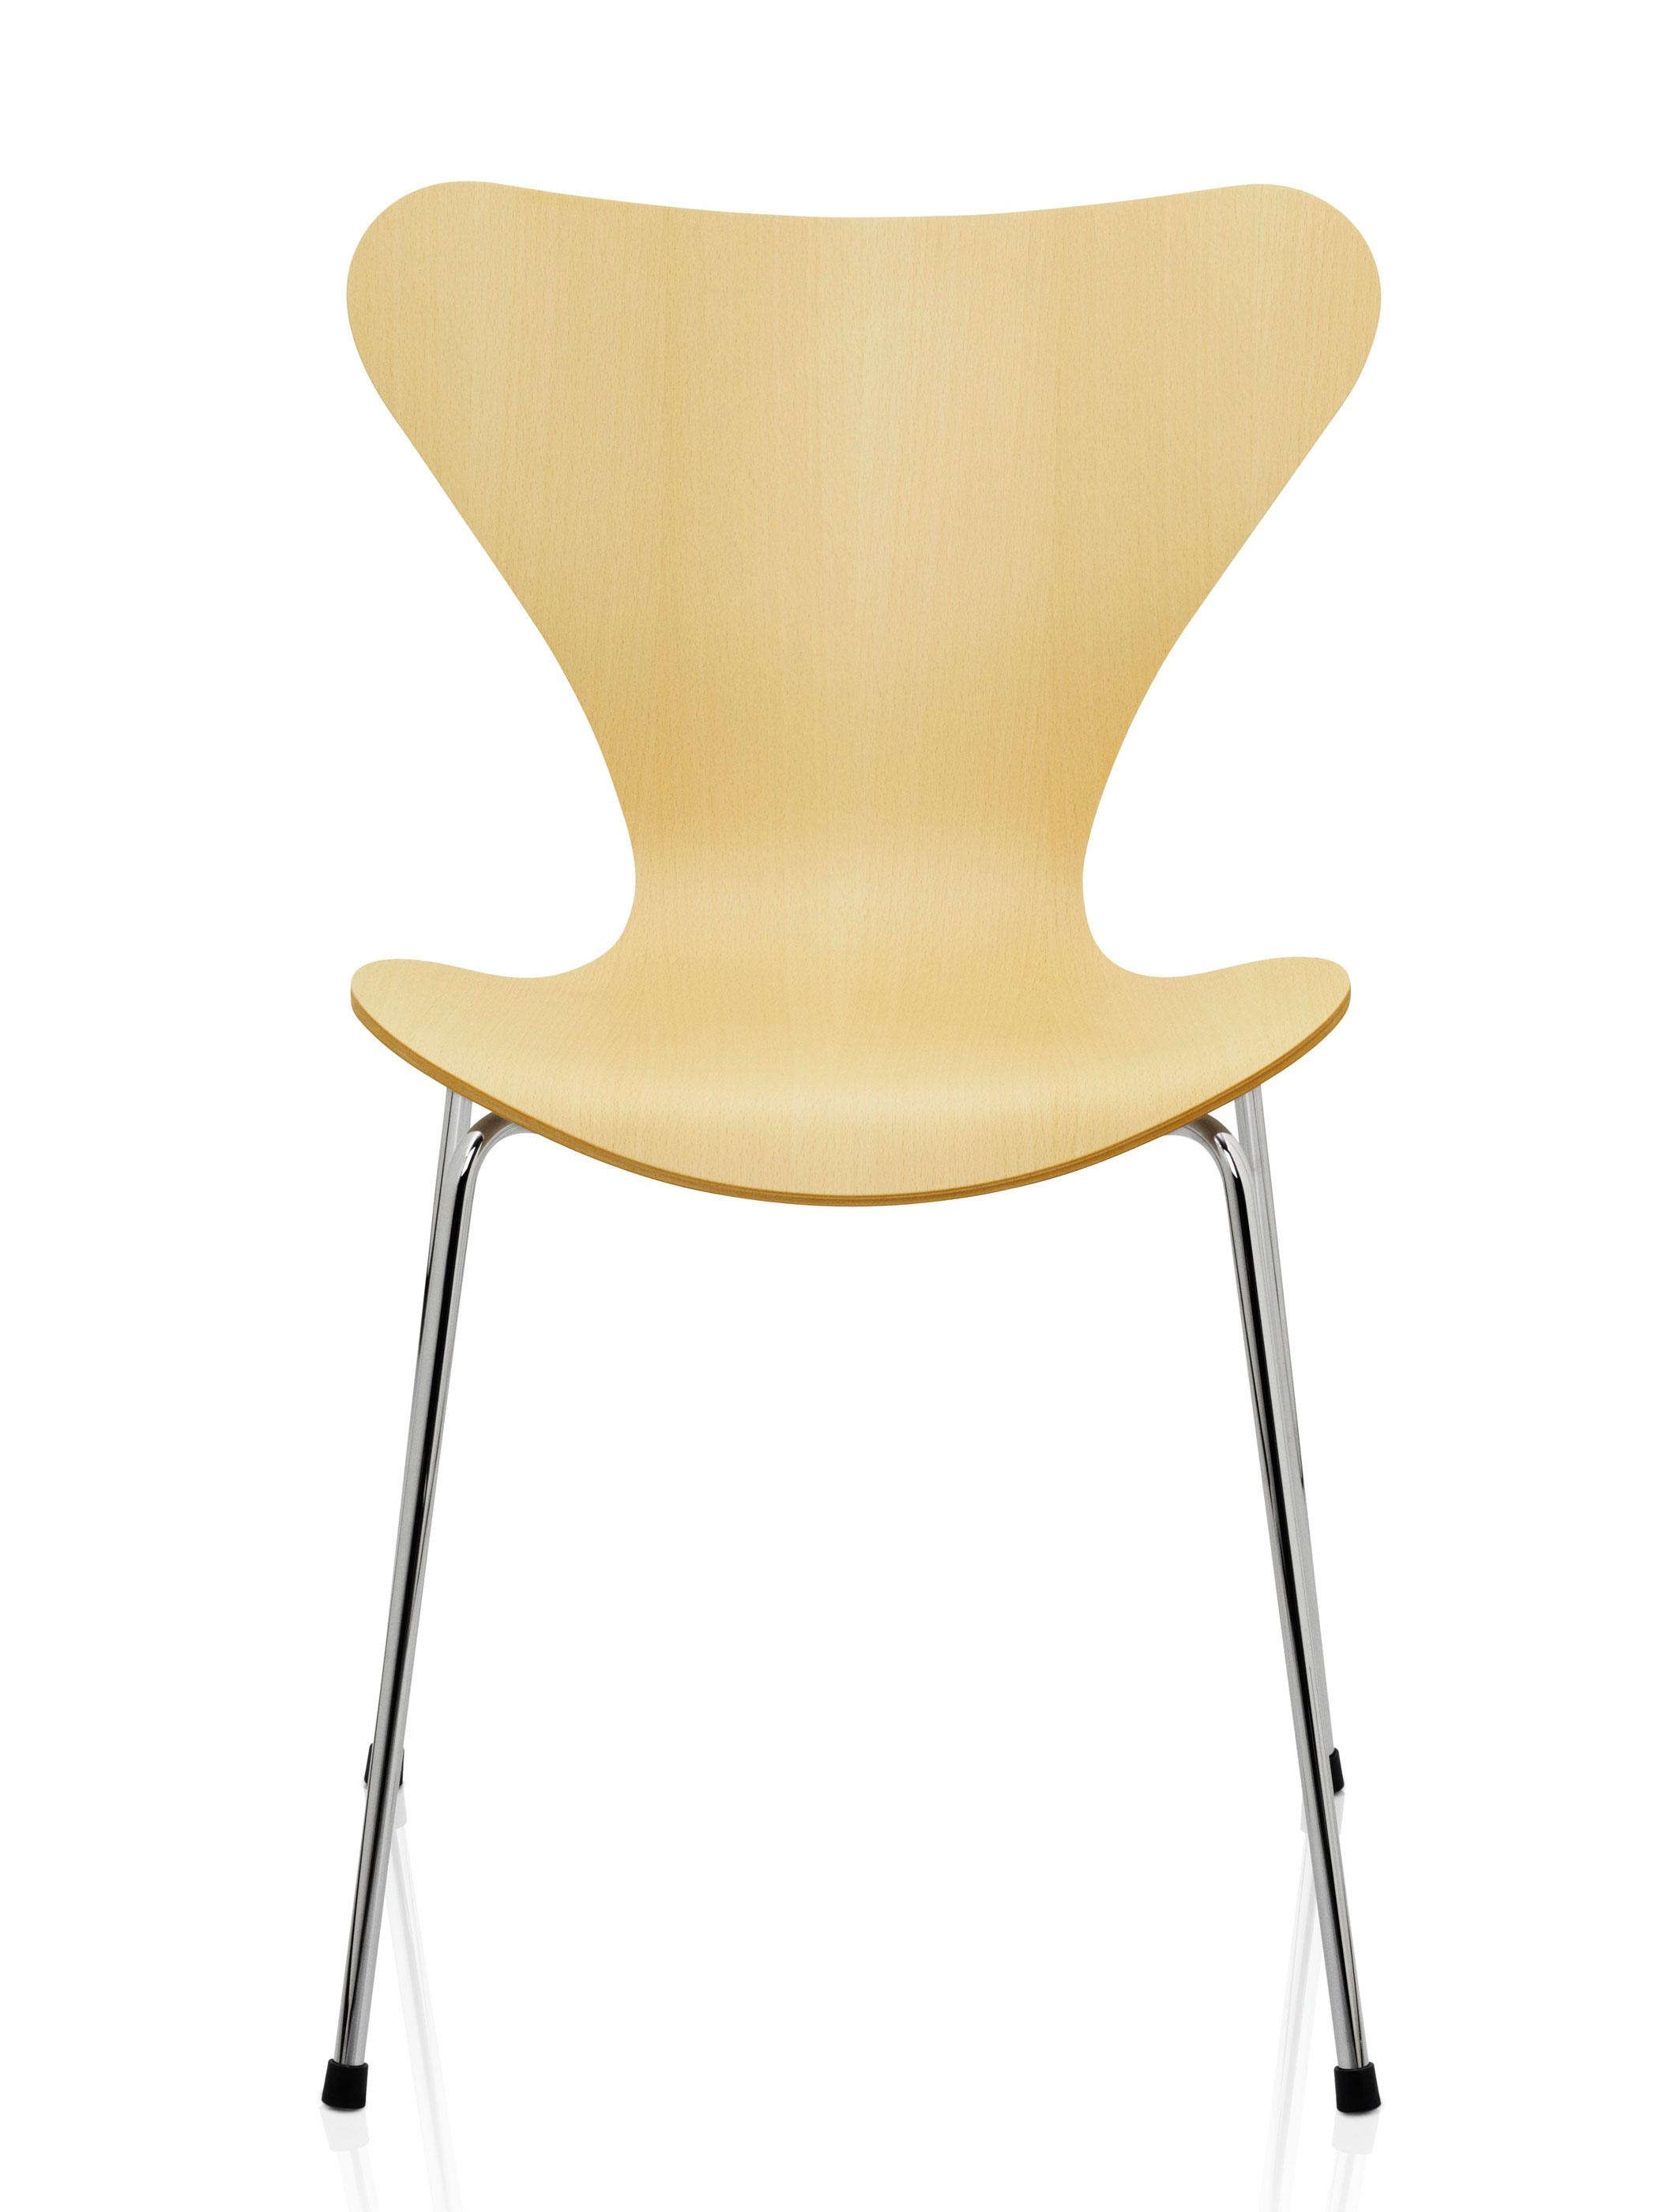 fritz hansen serie 7 3107 buche produktdetails. Black Bedroom Furniture Sets. Home Design Ideas